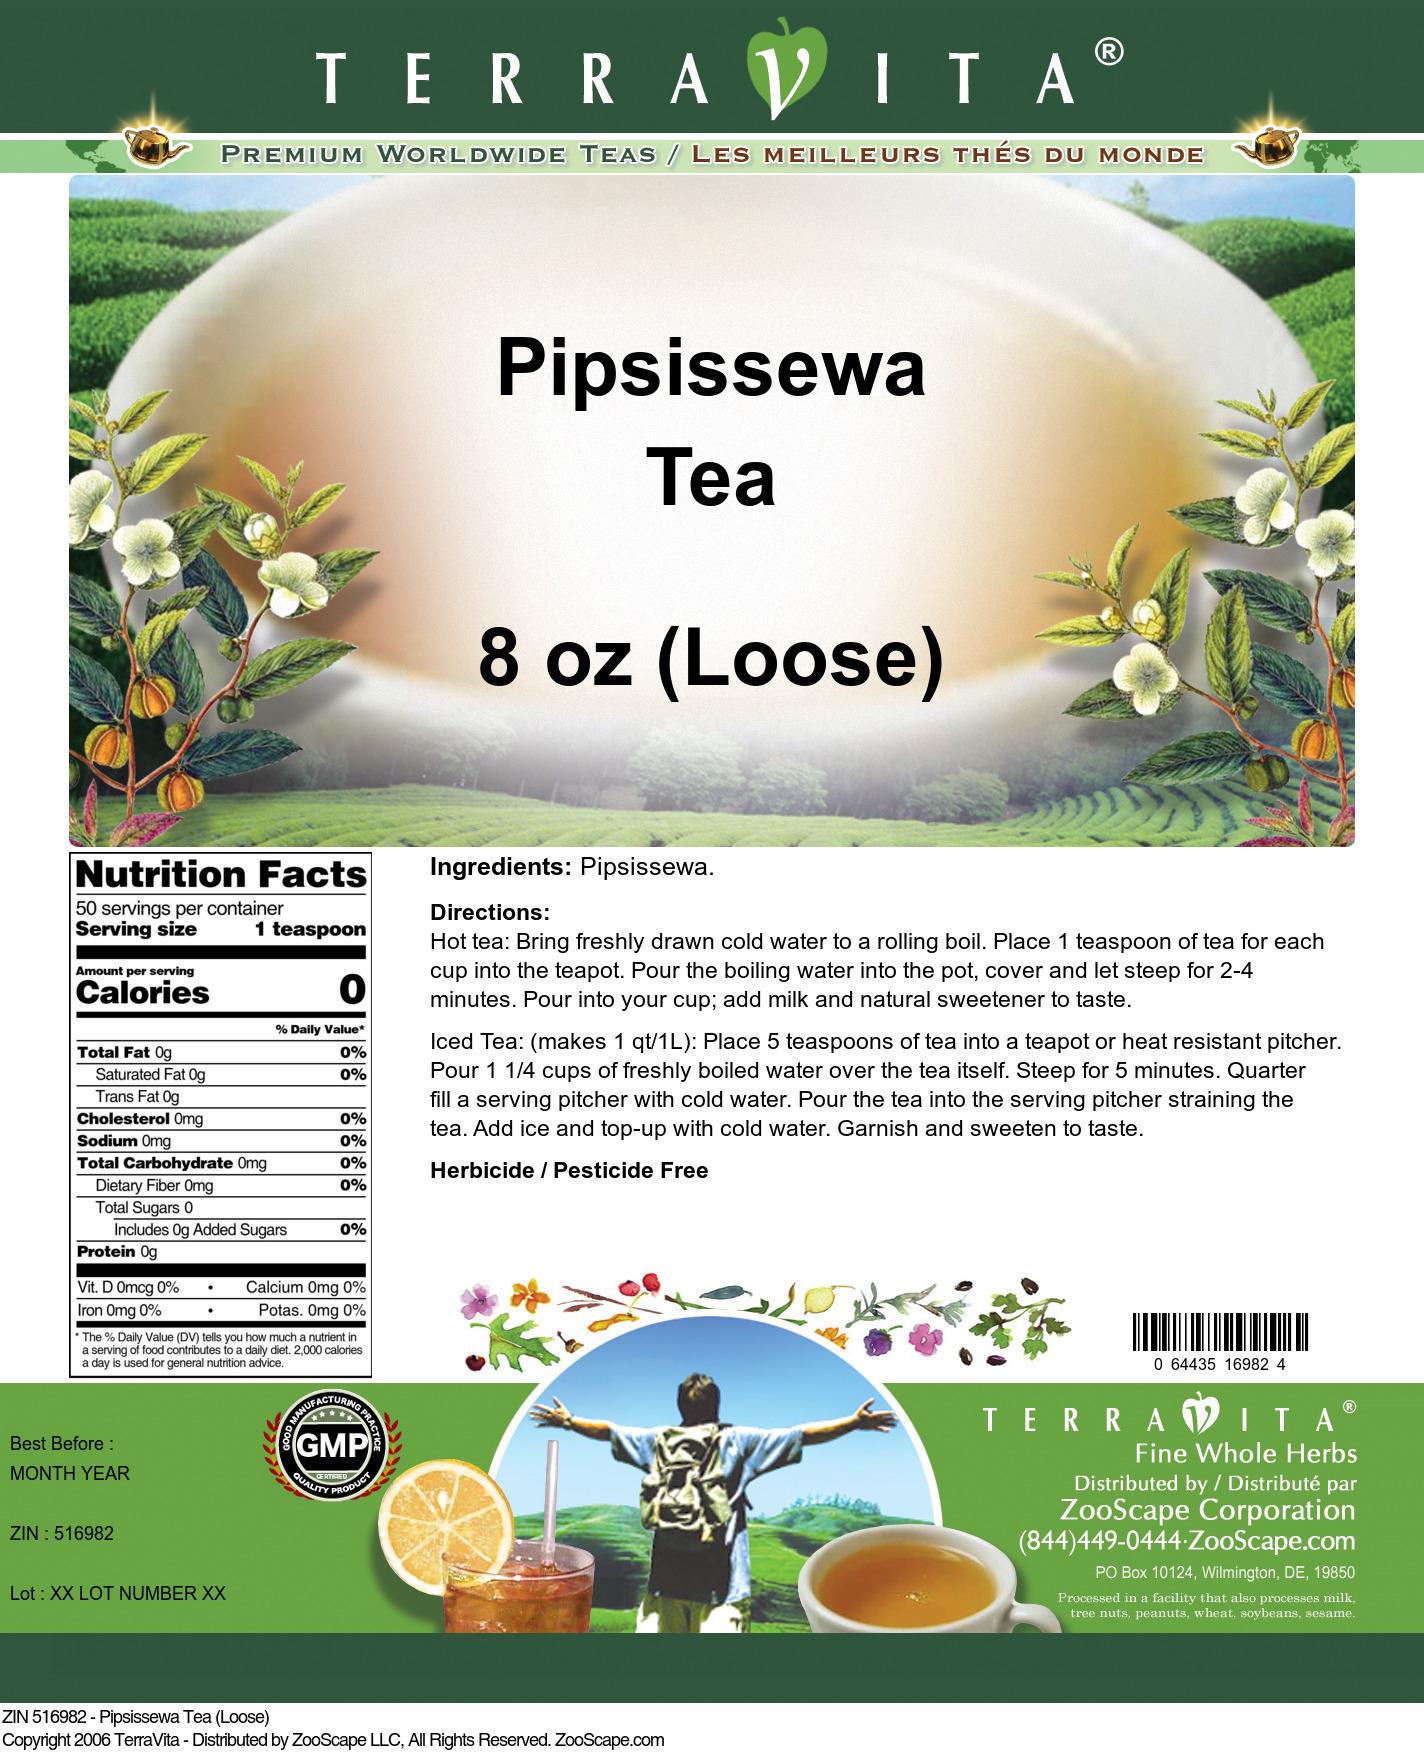 Pipsissewa Tea (Loose)